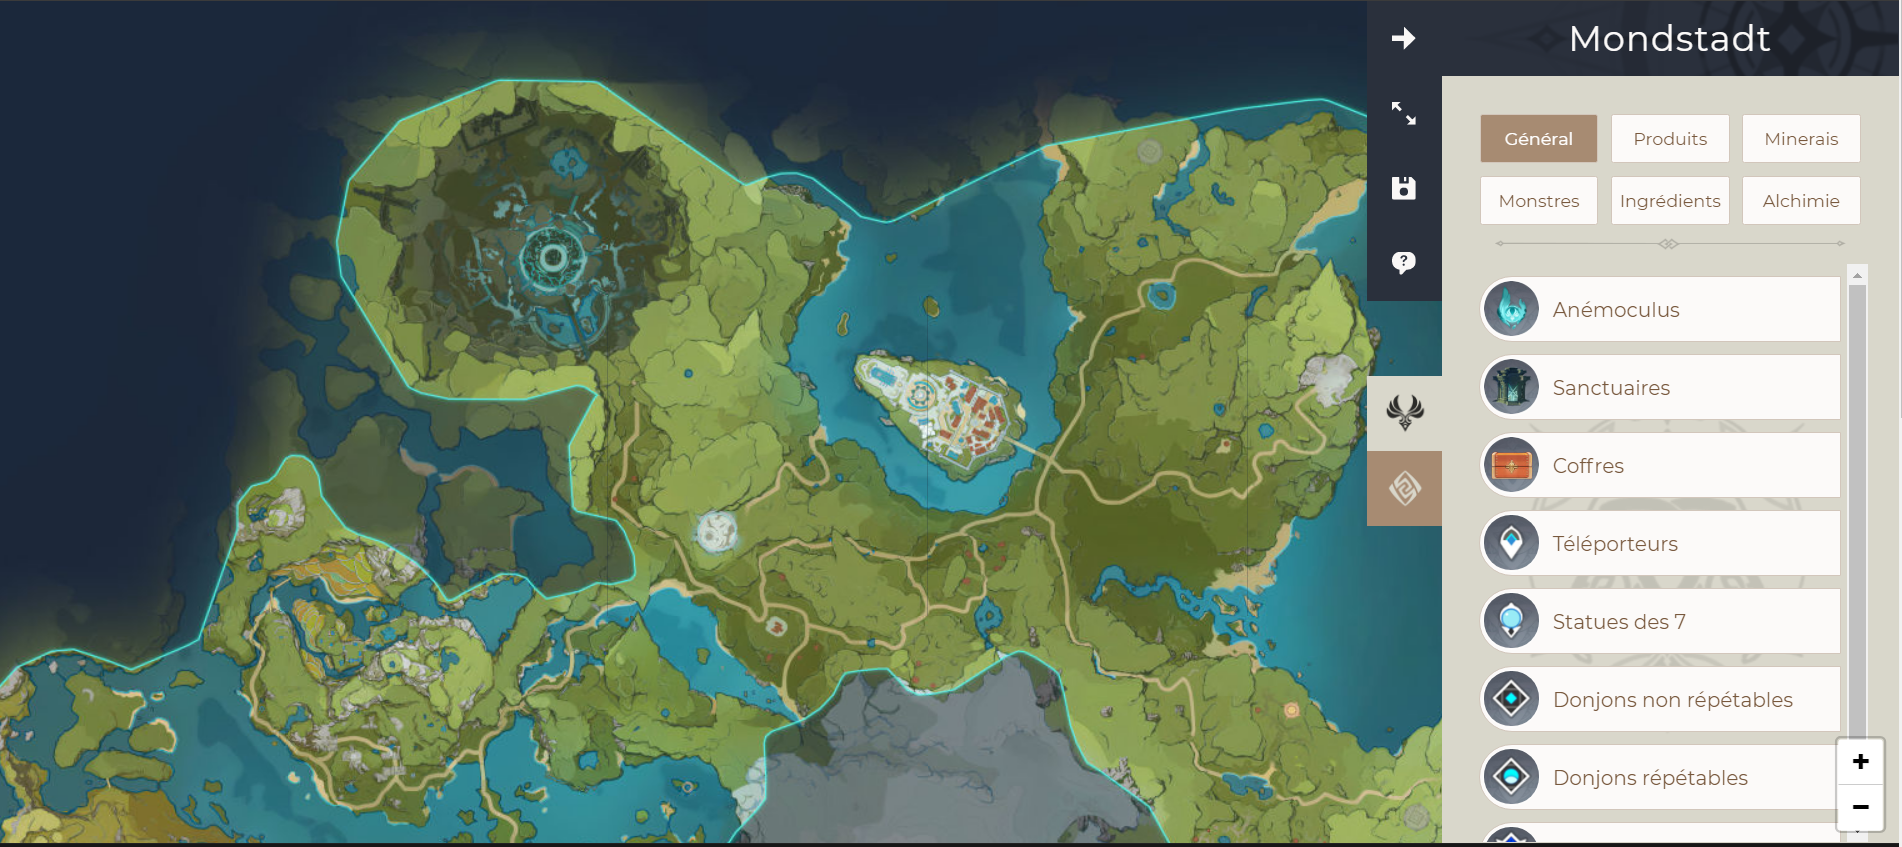 genshin-impact-map-interactive-ressources-fr-français